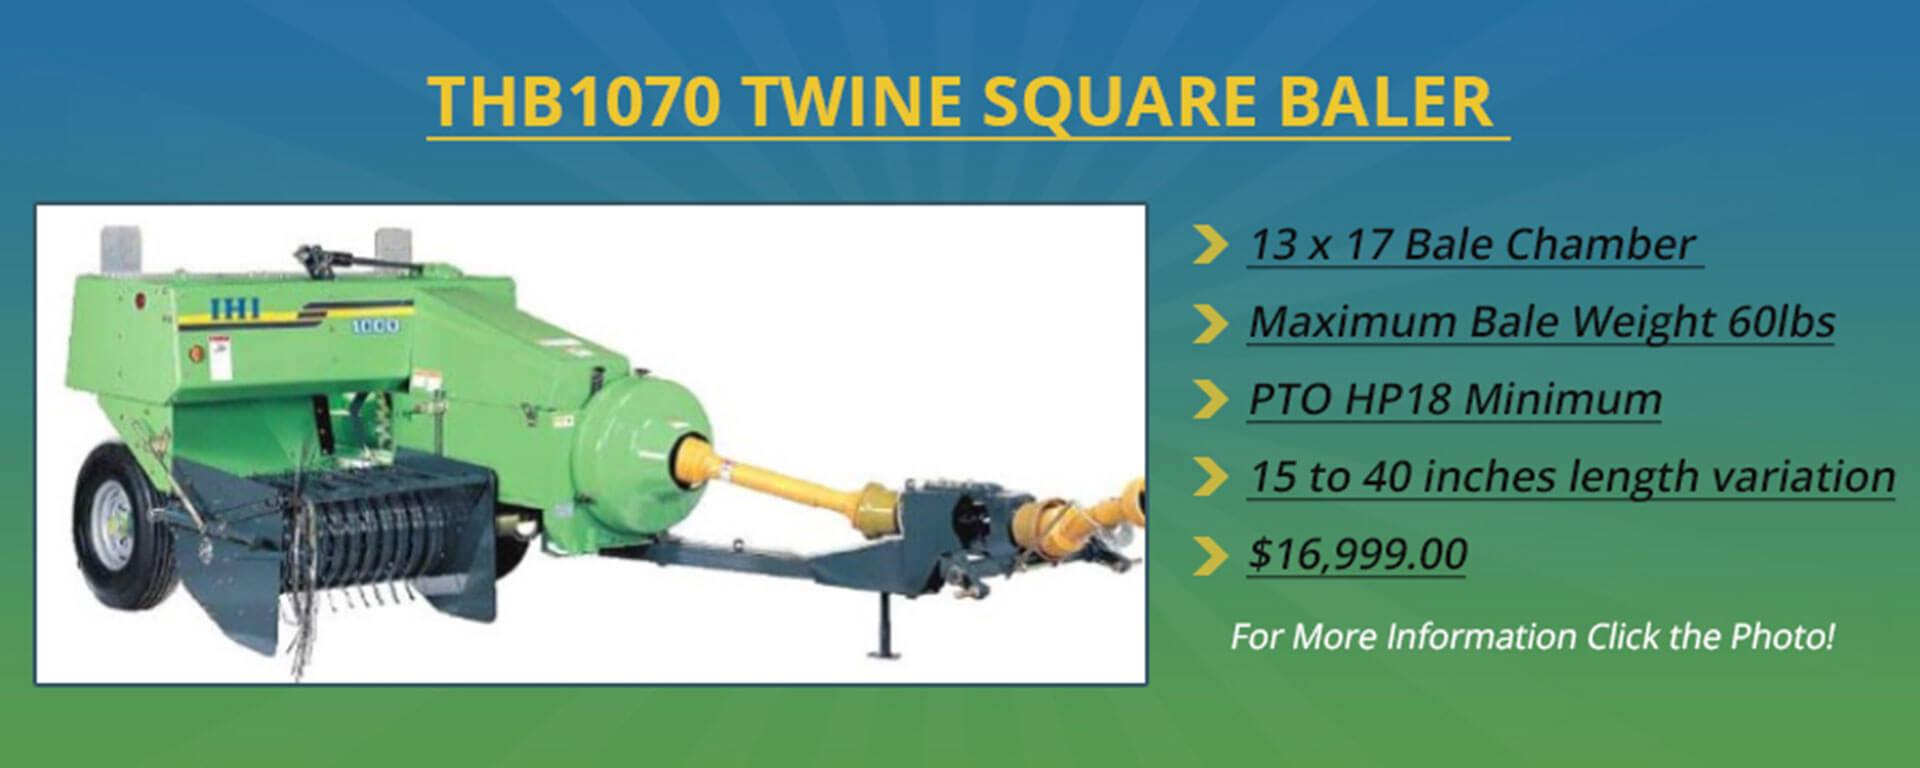 THB1070 Twine Square Baler